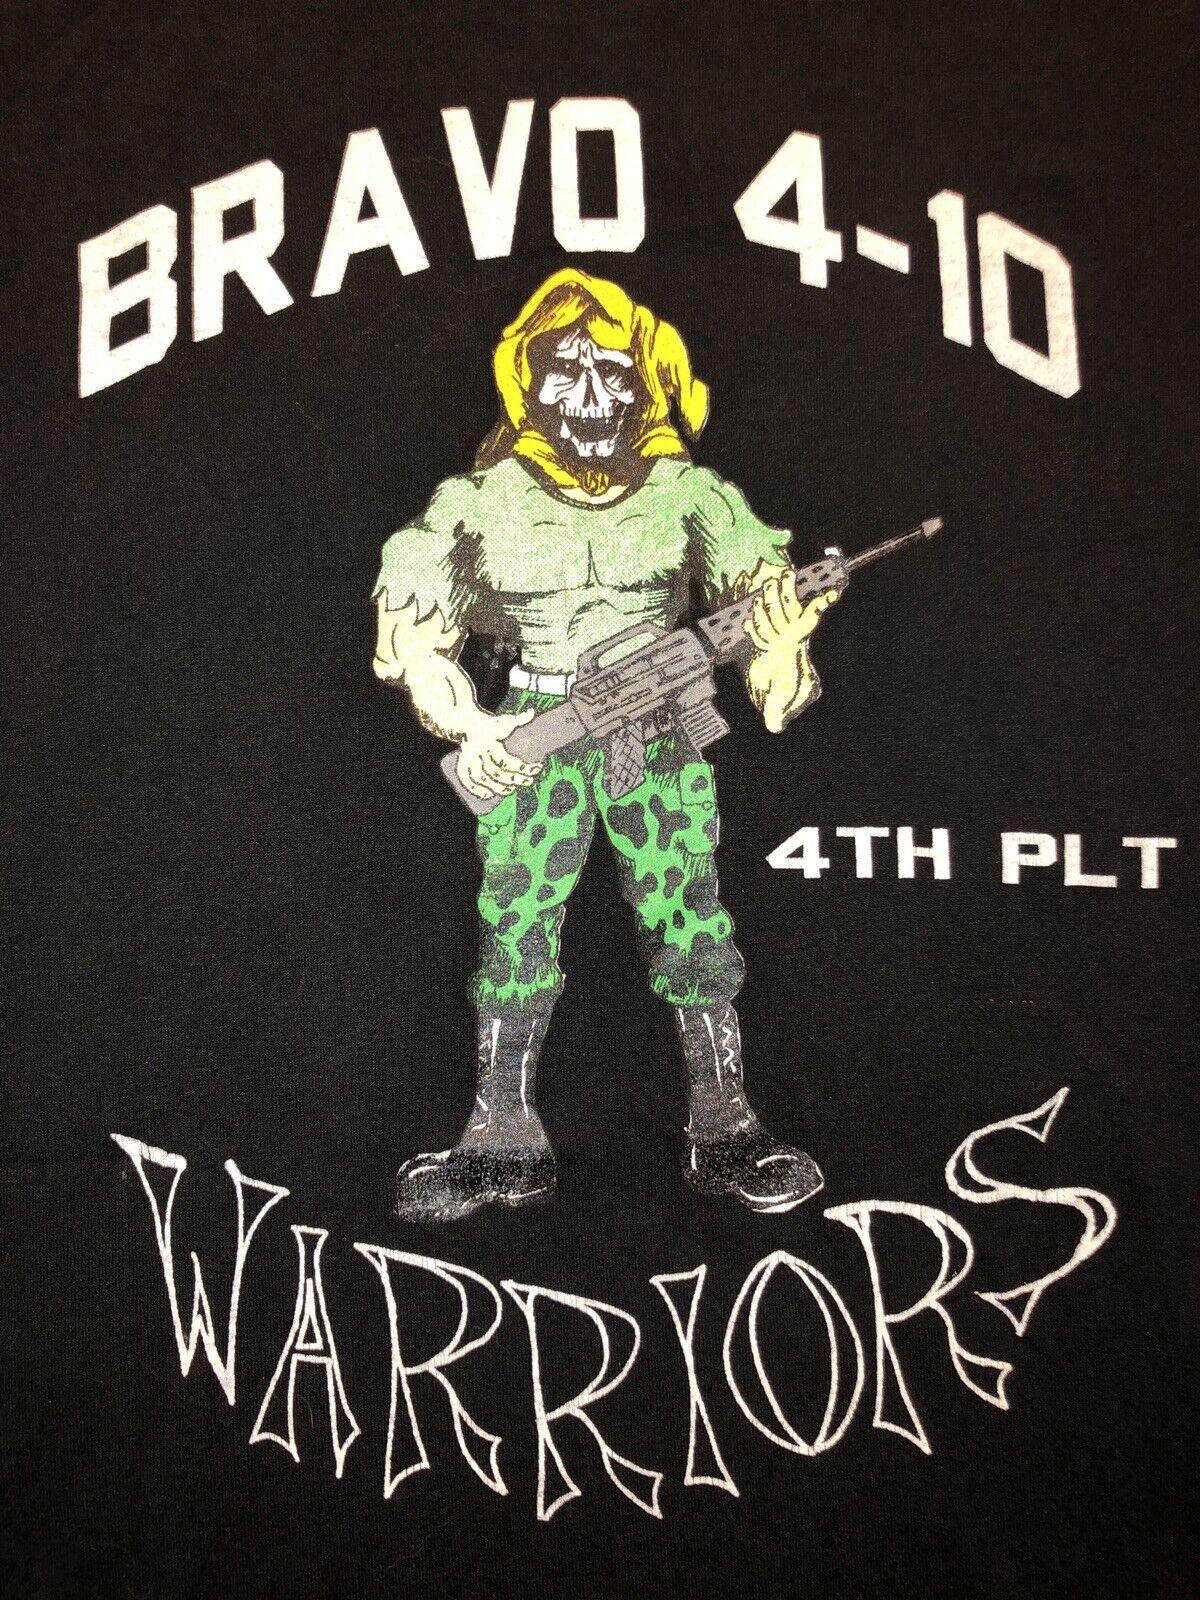 VTG 80s BRAVO 4-10 4th Platoon WARRIORS T-Shirt Skull Face 50 50 USA L MILITARY